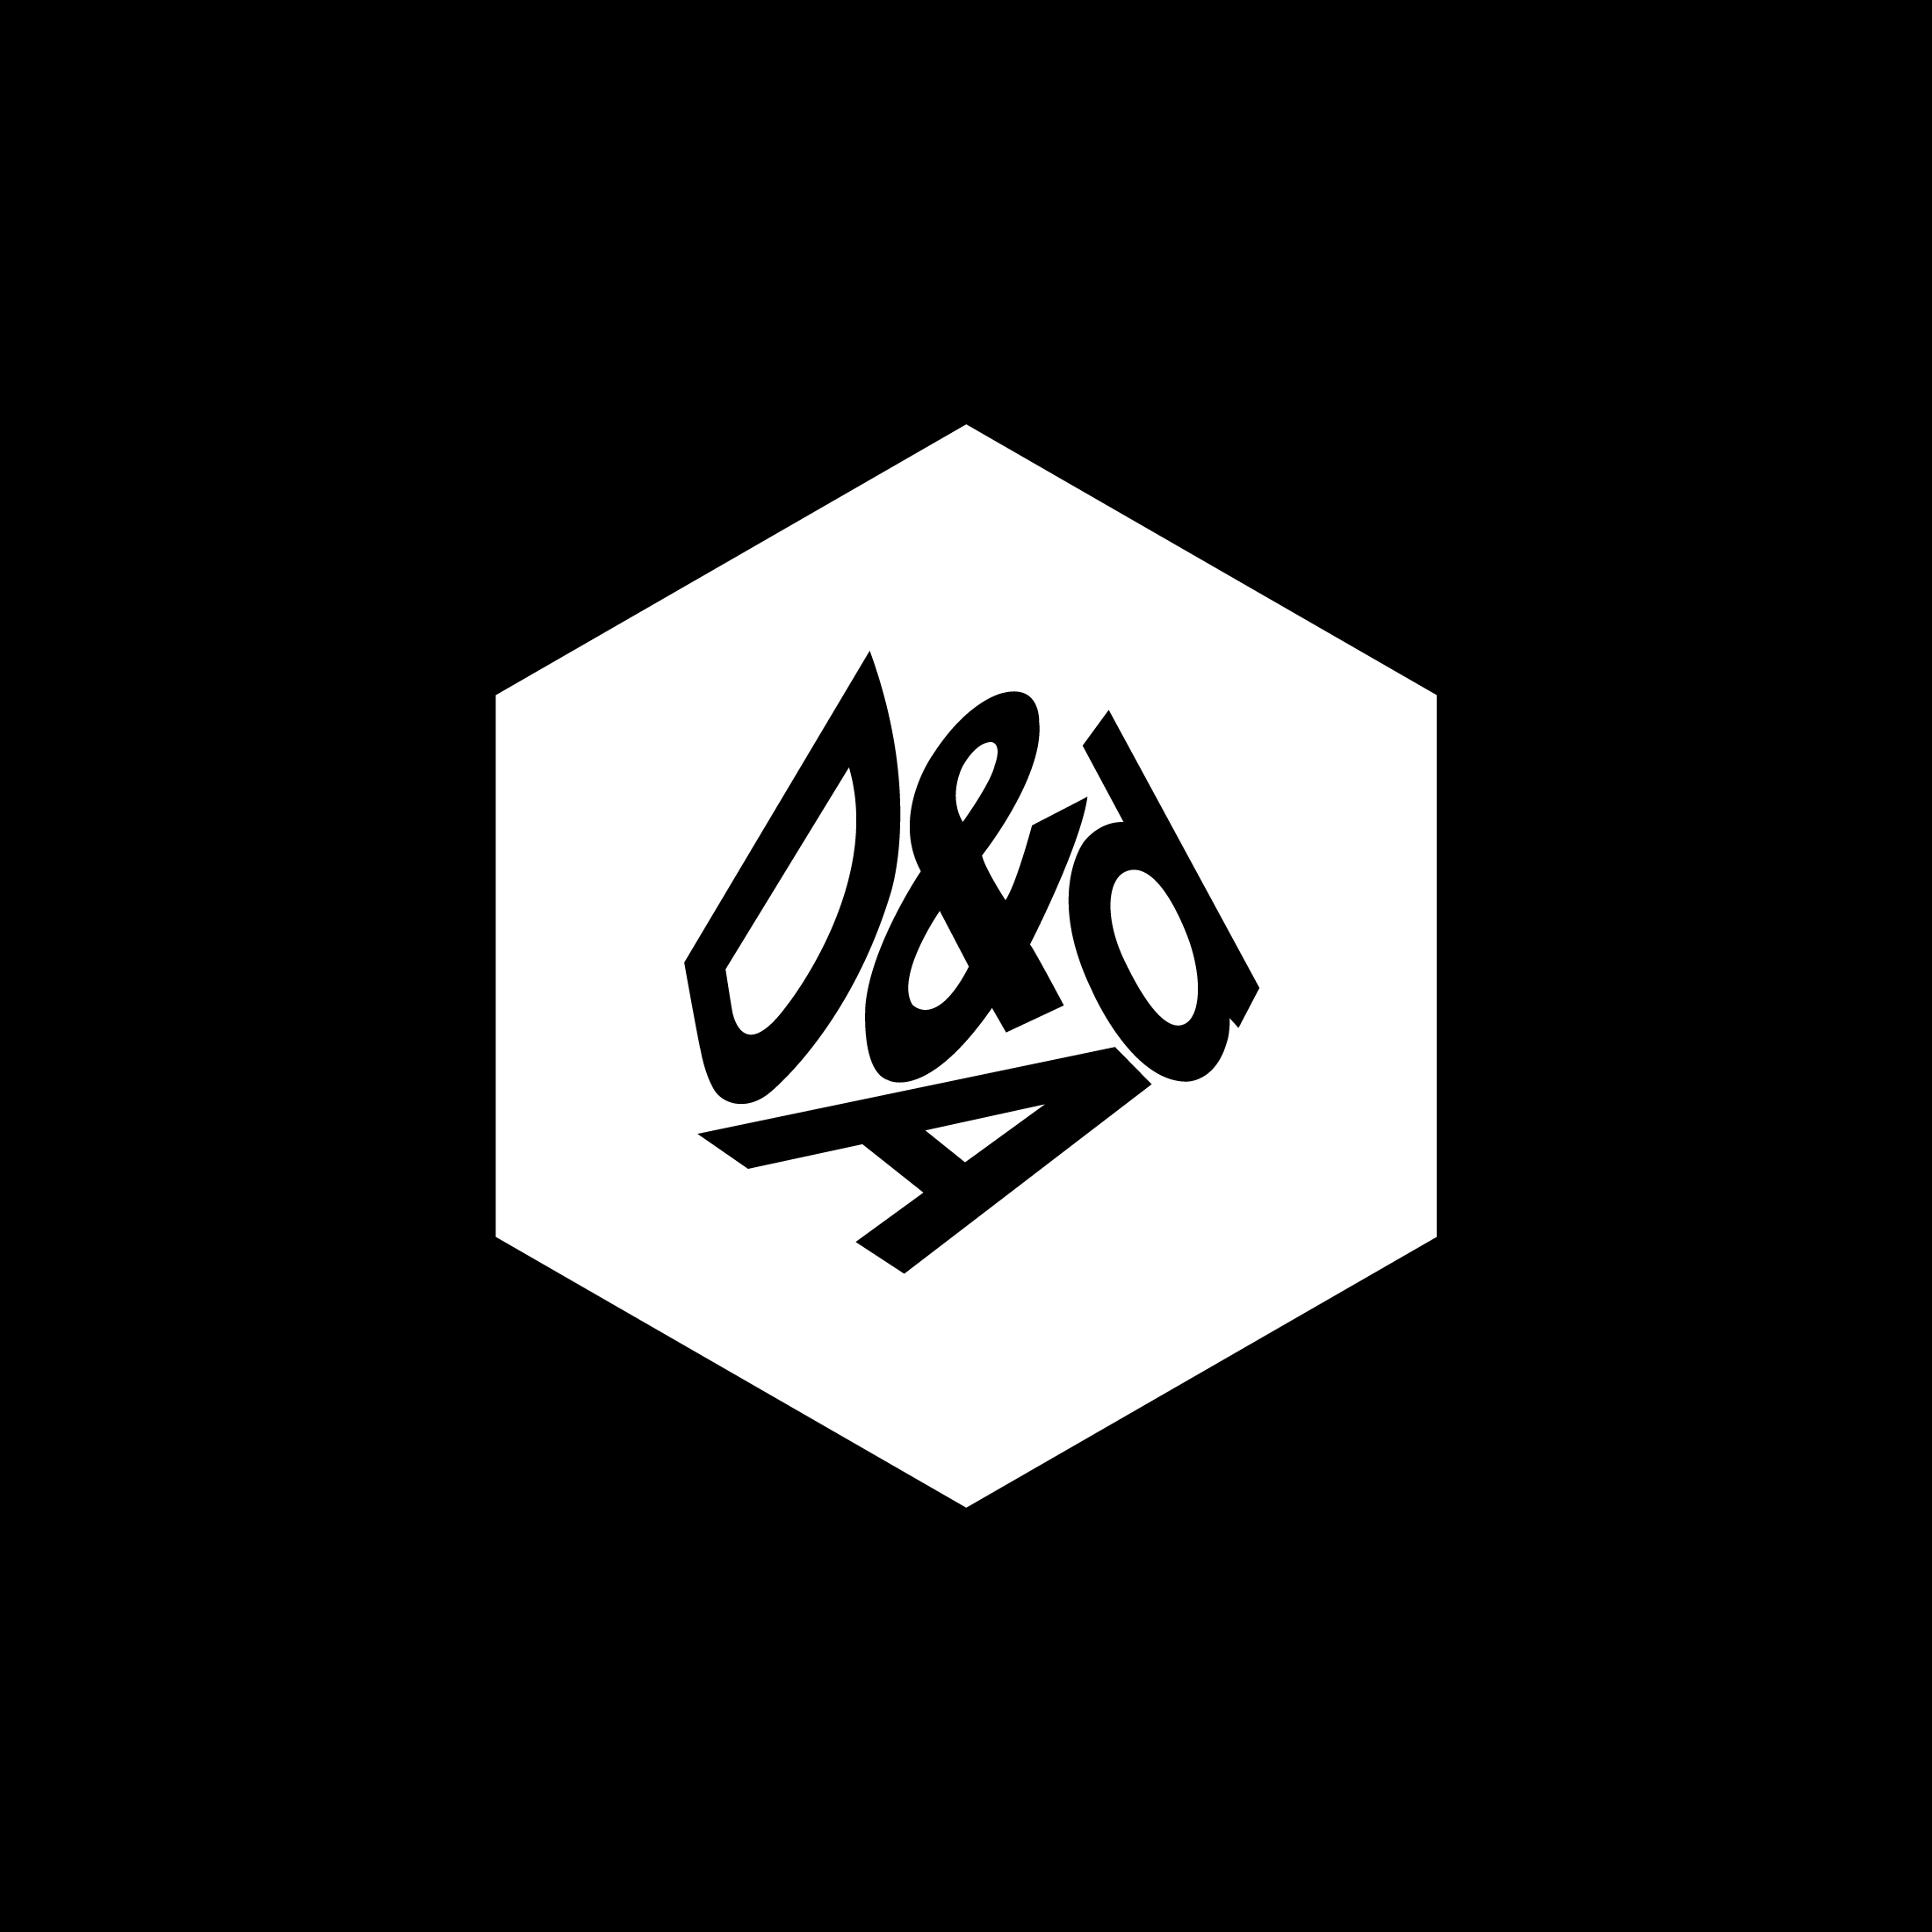 dandad-logo-roberto-nunez-studio-award